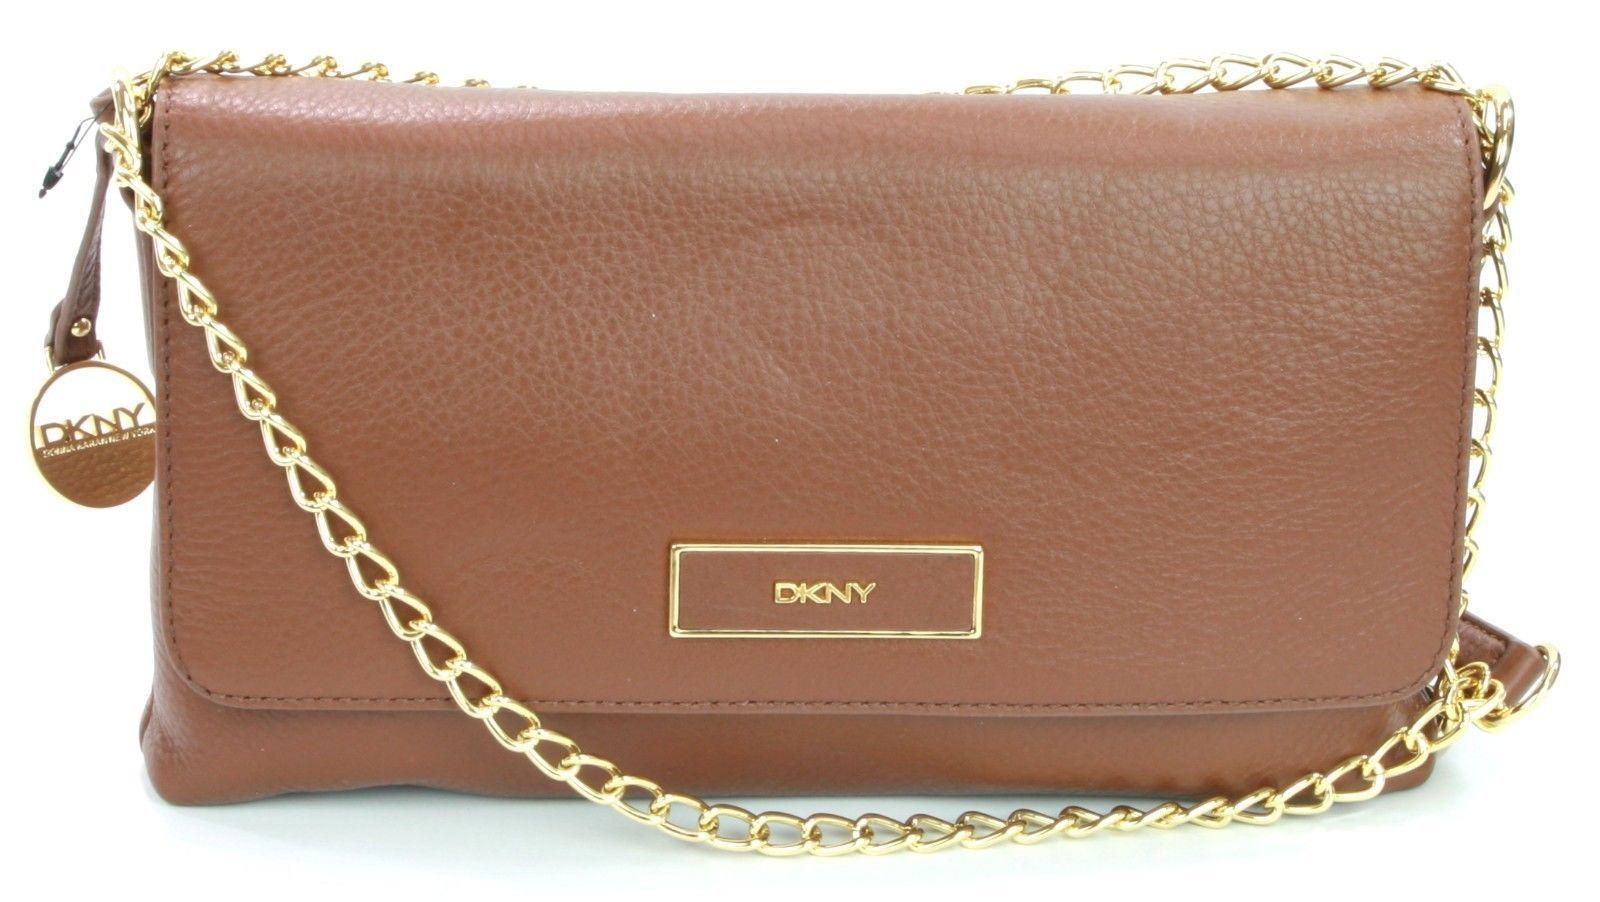 DKNY Donna Karan Brown Leather Shoulder Bag Handbag Small RRP £225